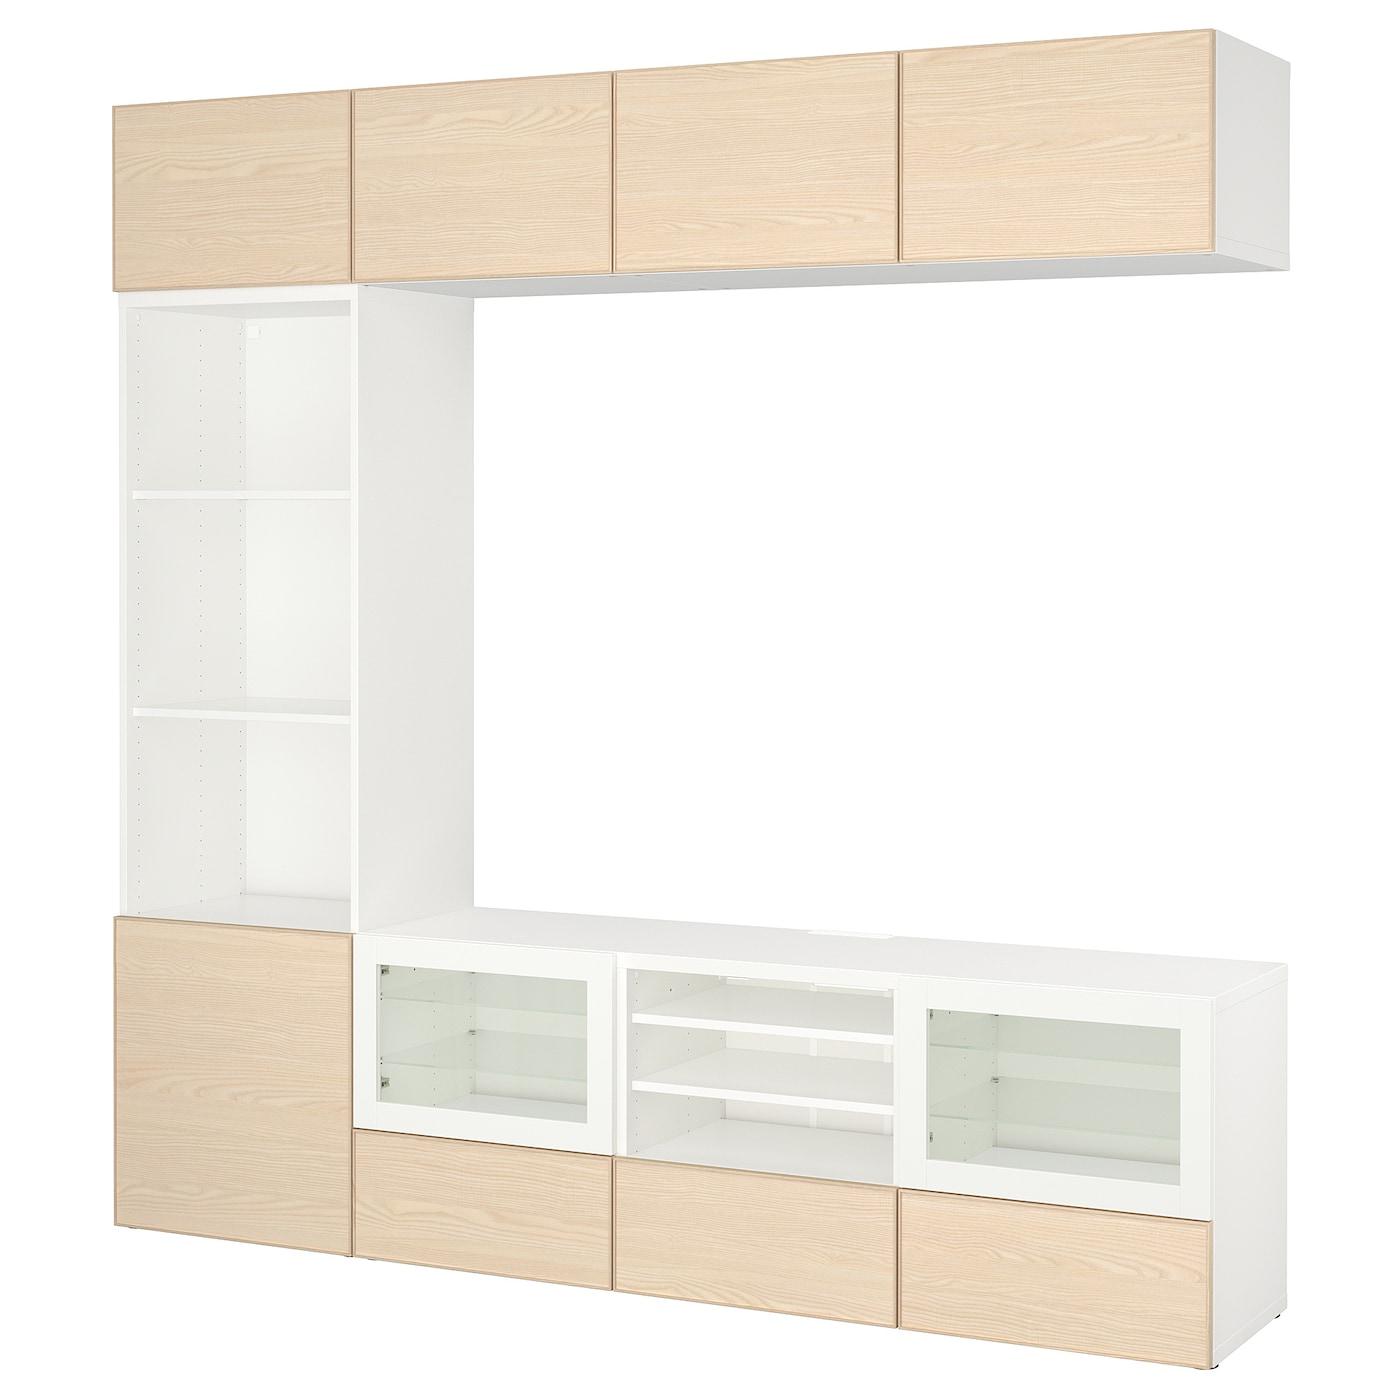 Best mueble tv con almacenaje blanco inviken chapa fresno for Muebles almacenaje ikea